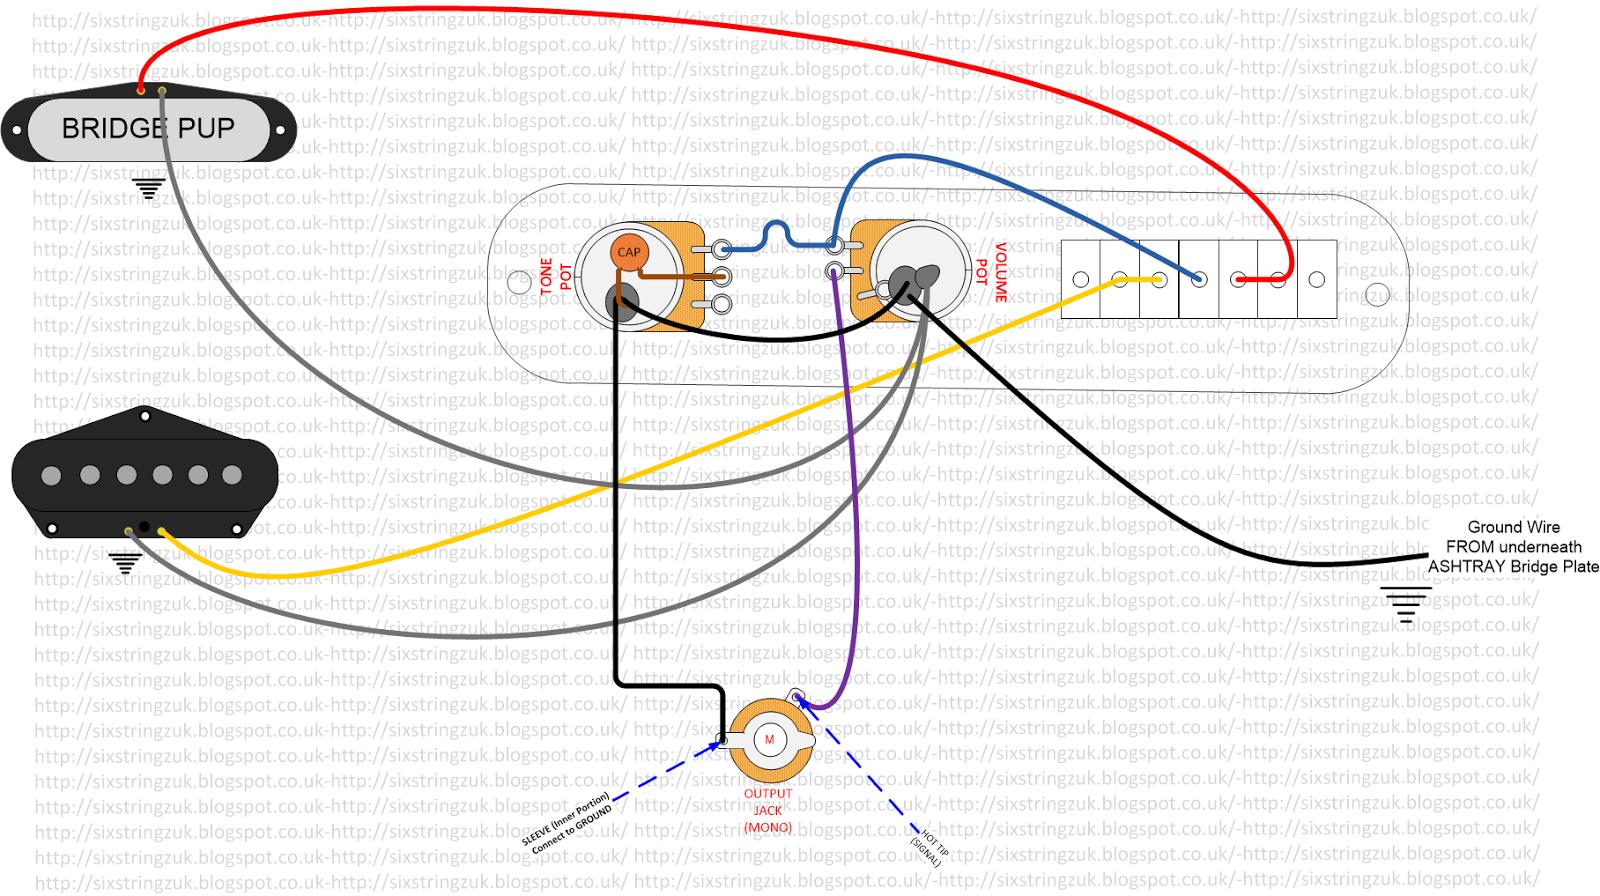 ... yamaha pacifica wiring diagram the david gilmour black strat wiring  Fender Strat Pickguard Wiring-Diagram